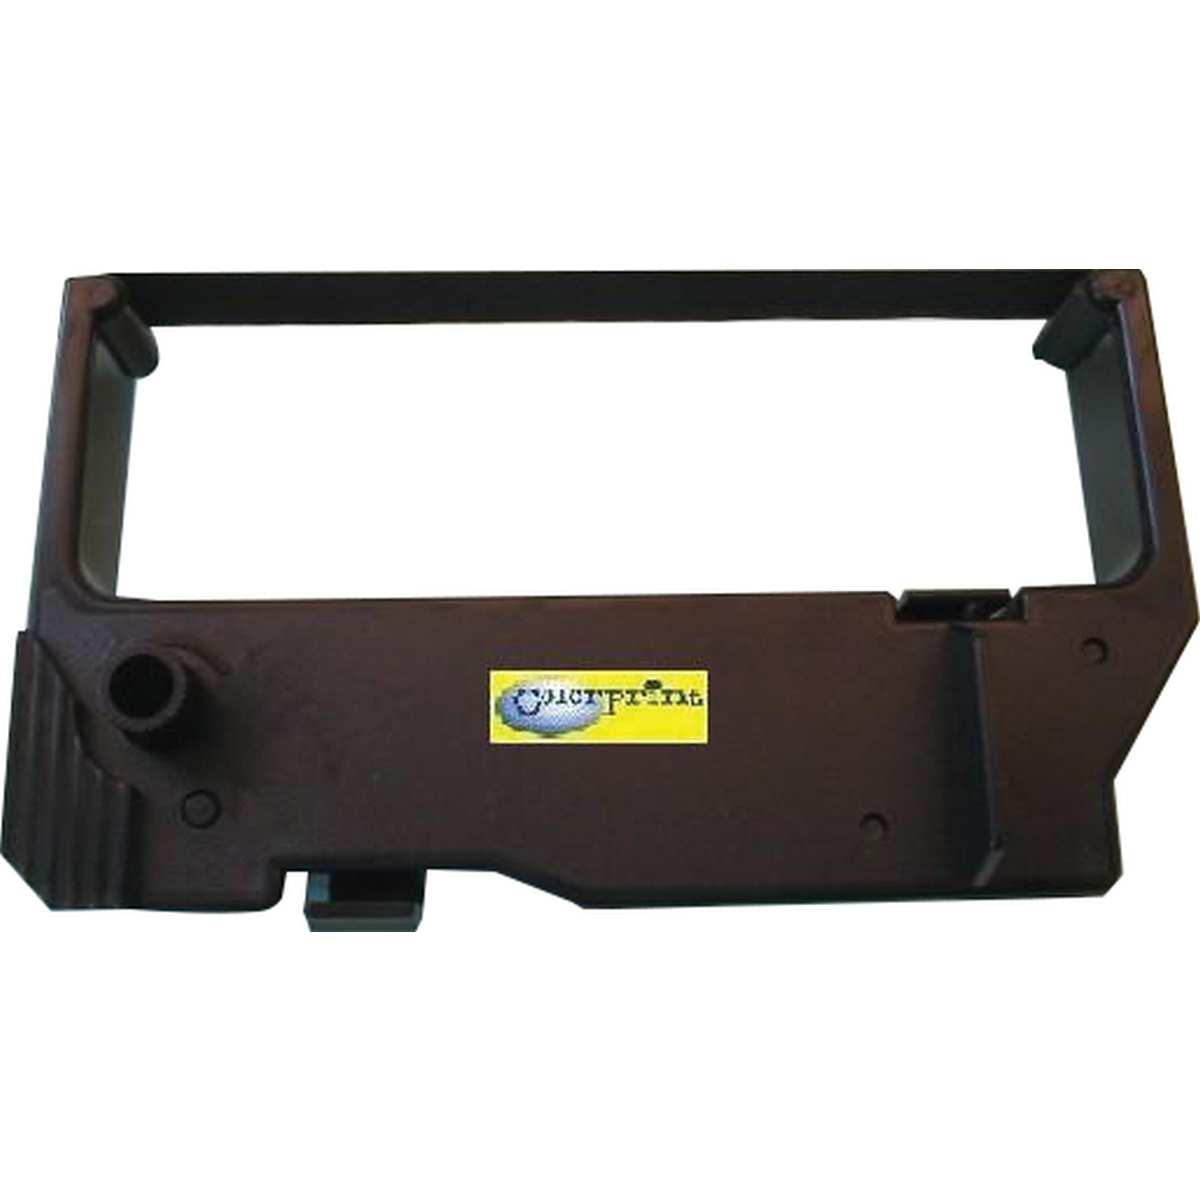 Fita para Impressora STAR SP 200 13MMX3,5M. Preta